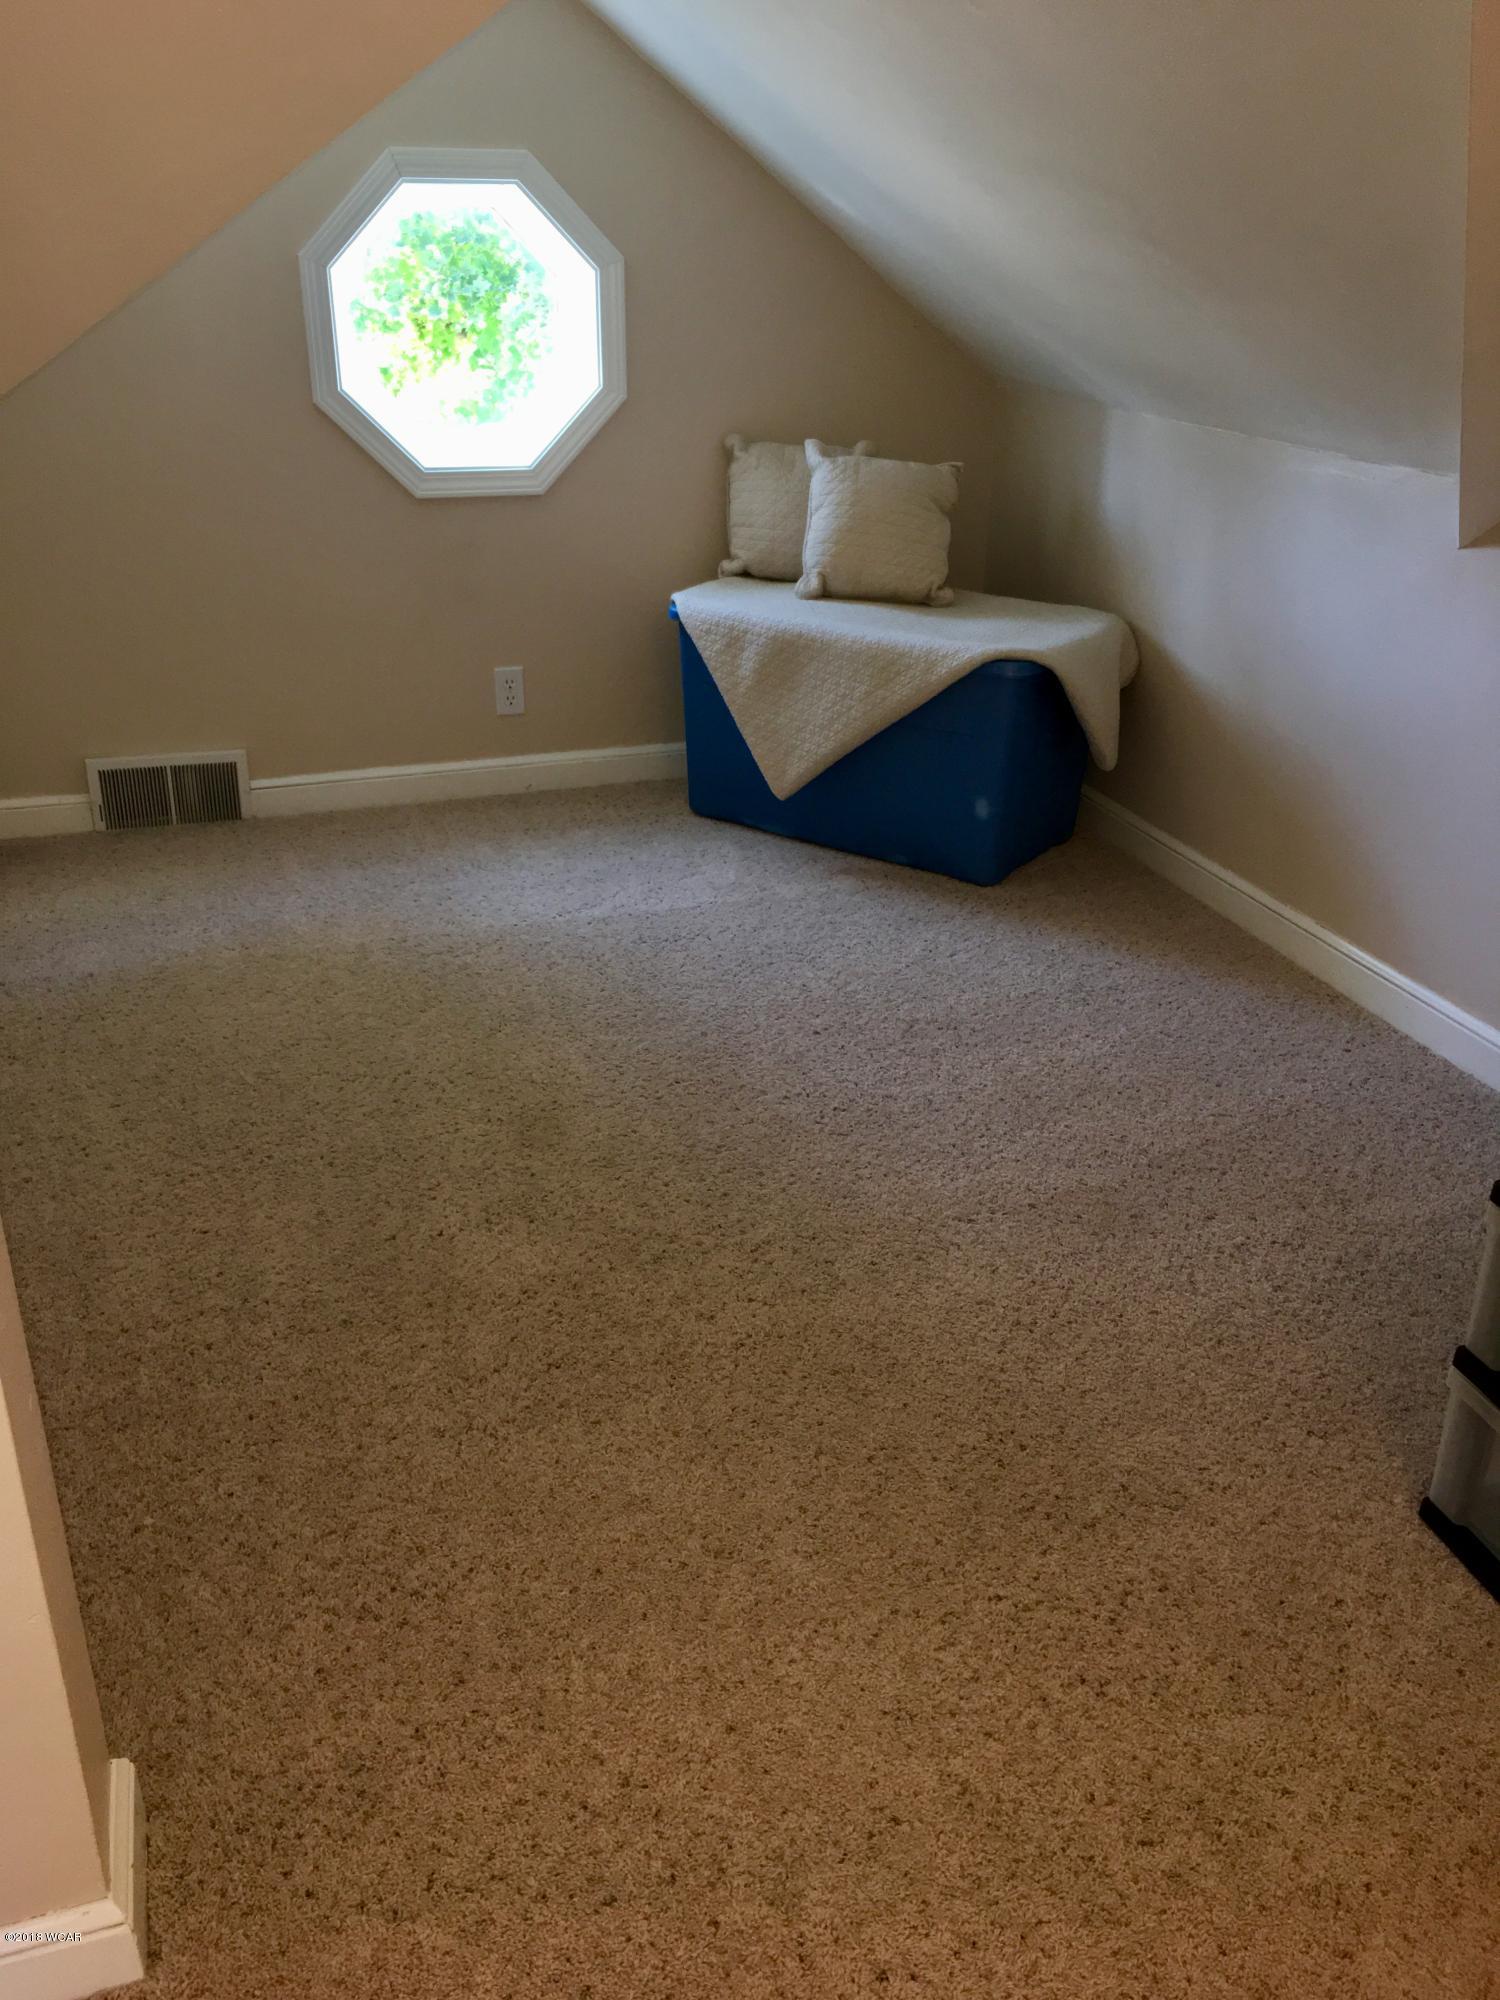 613 13th Street,Willmar,3 Bedrooms Bedrooms,2 BathroomsBathrooms,Single Family,13th Street,6032655